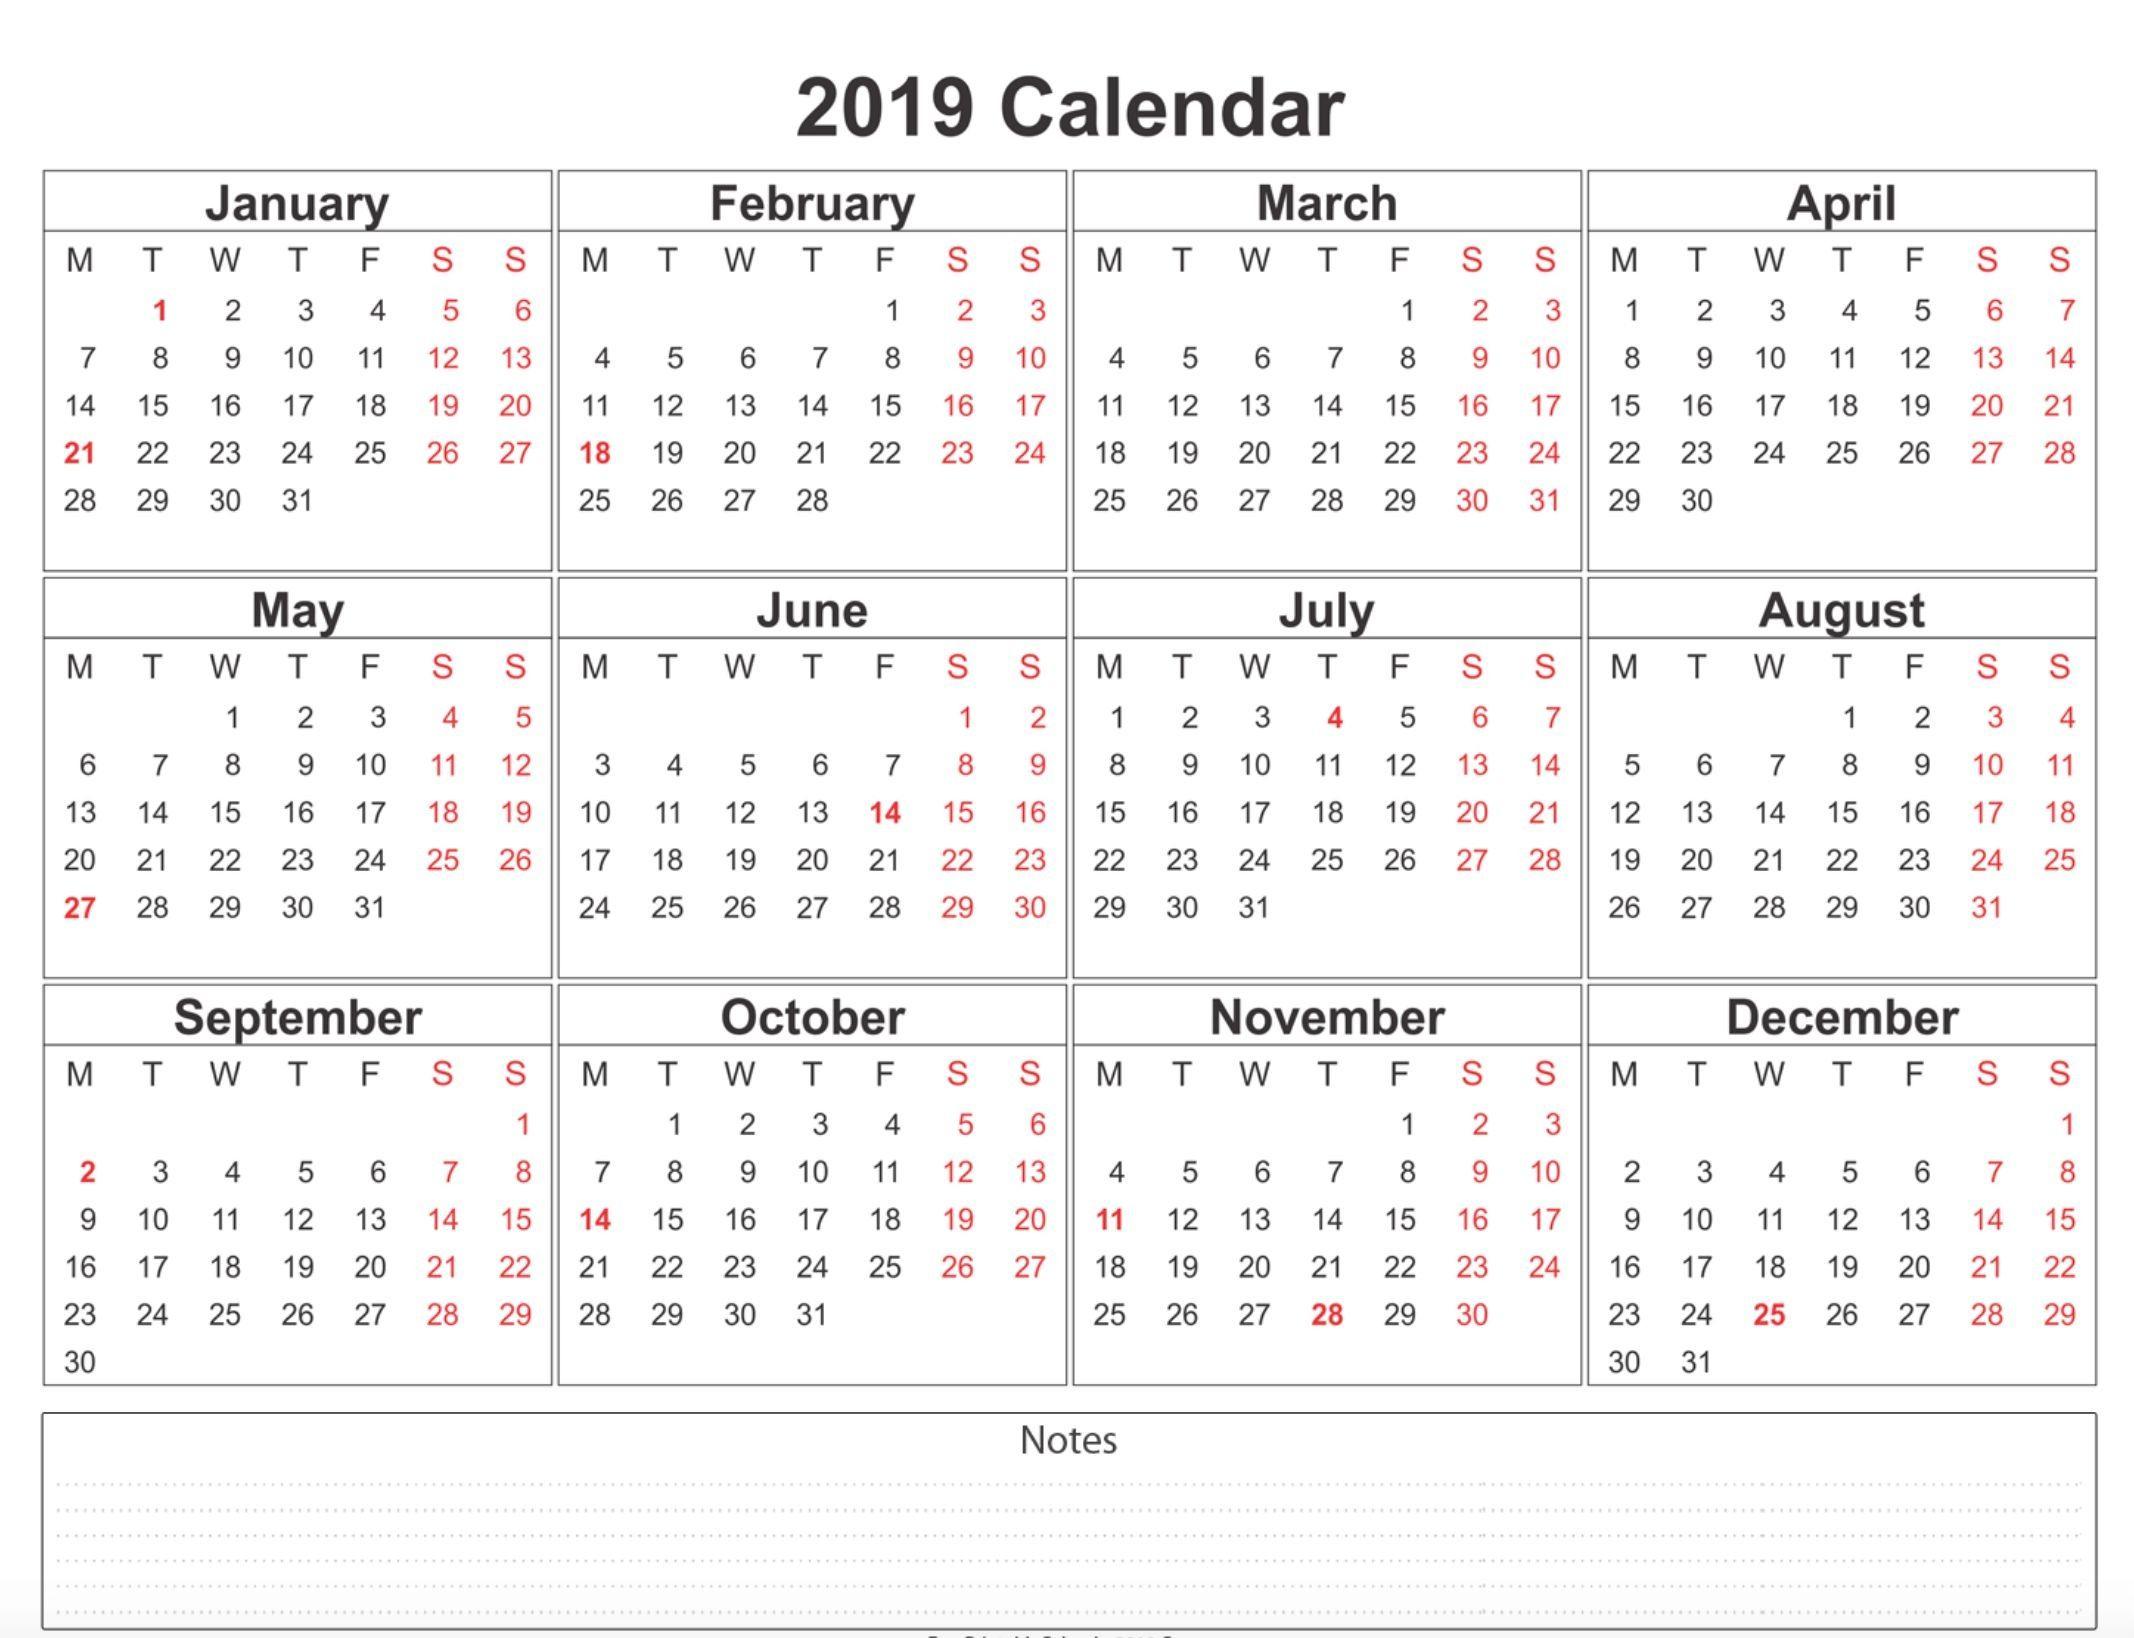 2019 Weekly Calendar Printable | 2019 Calendars | 12 Month Calendar for Calendar With Holidays Printable Templates